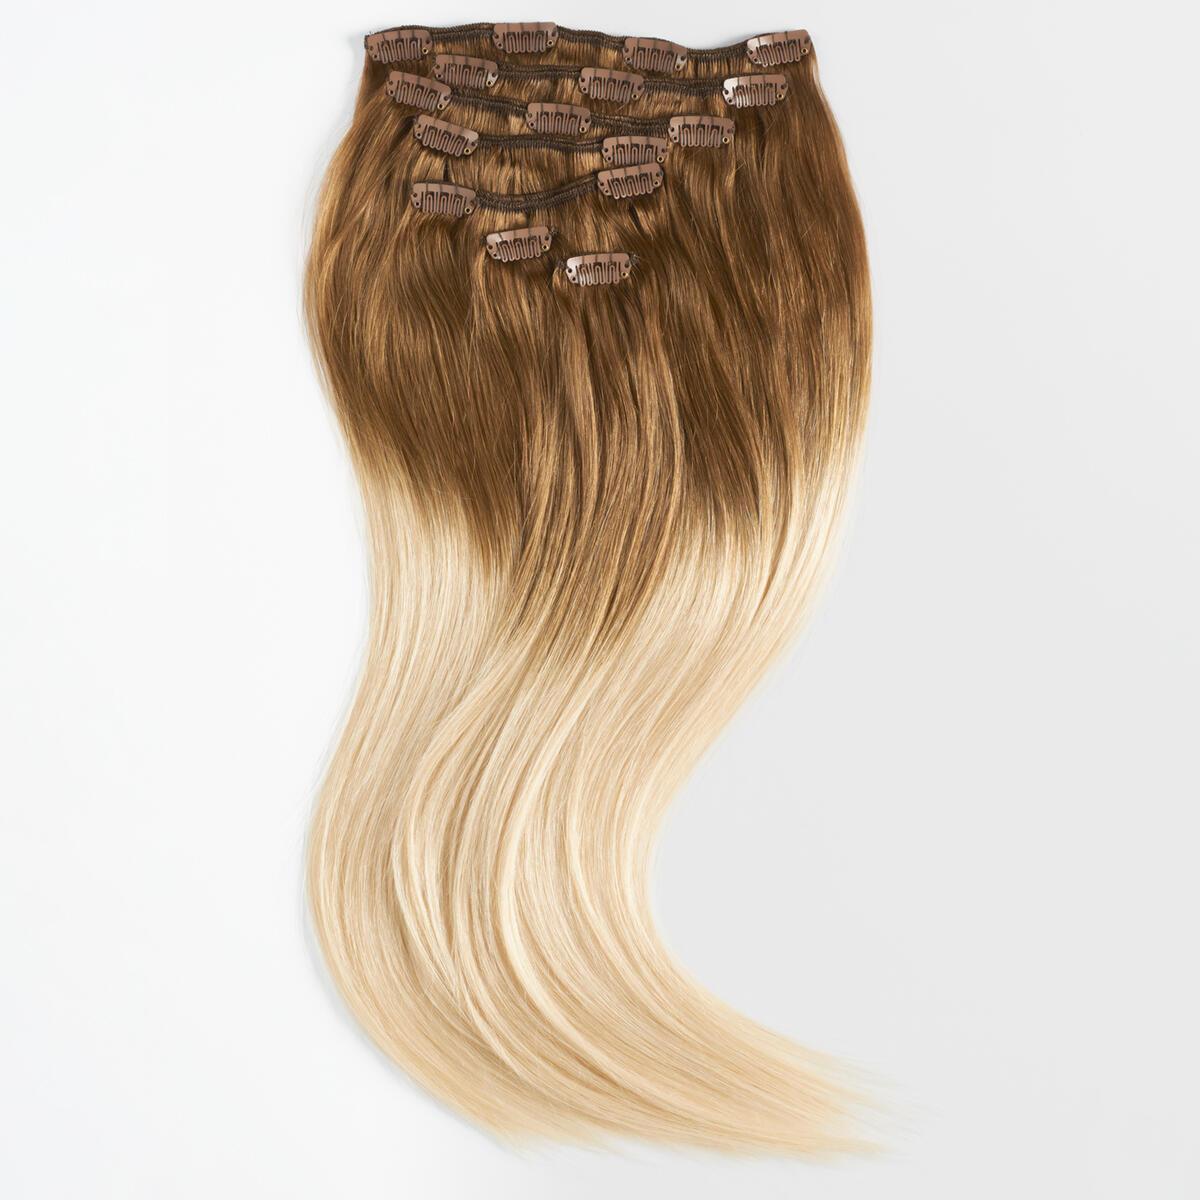 Clip-on set Premium 7 pieces O5.1/10.8 Medium Ash Blond Ombre 50 cm